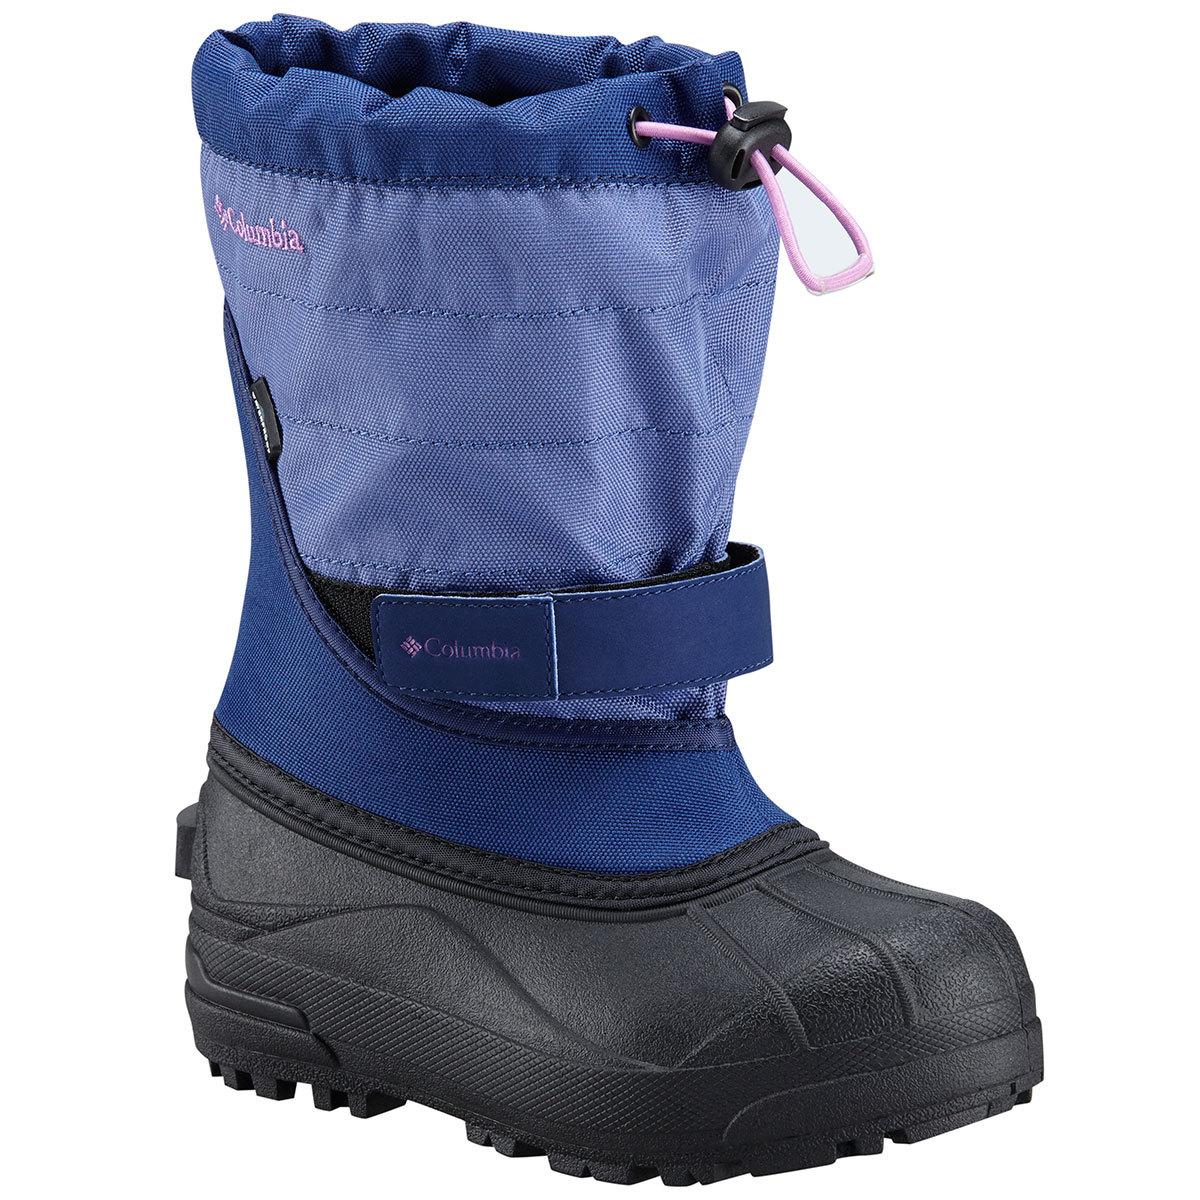 Columbia Girls' Powderbug Plus Ii Waterproof Snow Boots, Eve/northern Lights - Purple, 4